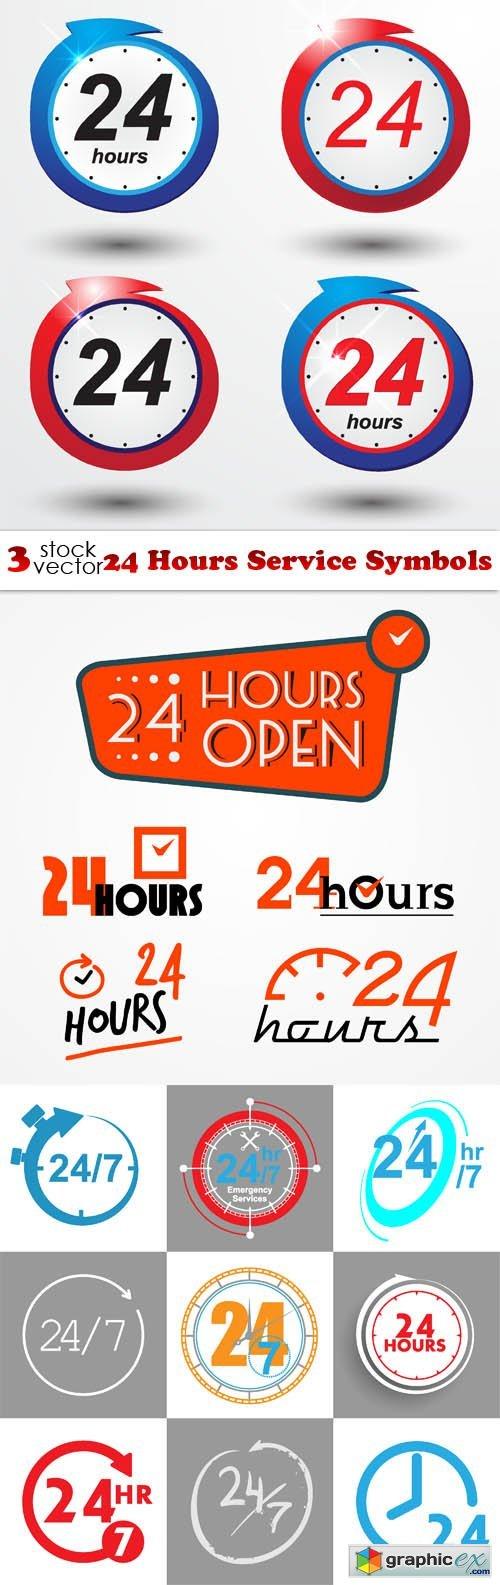 24 Hours Service Symbols